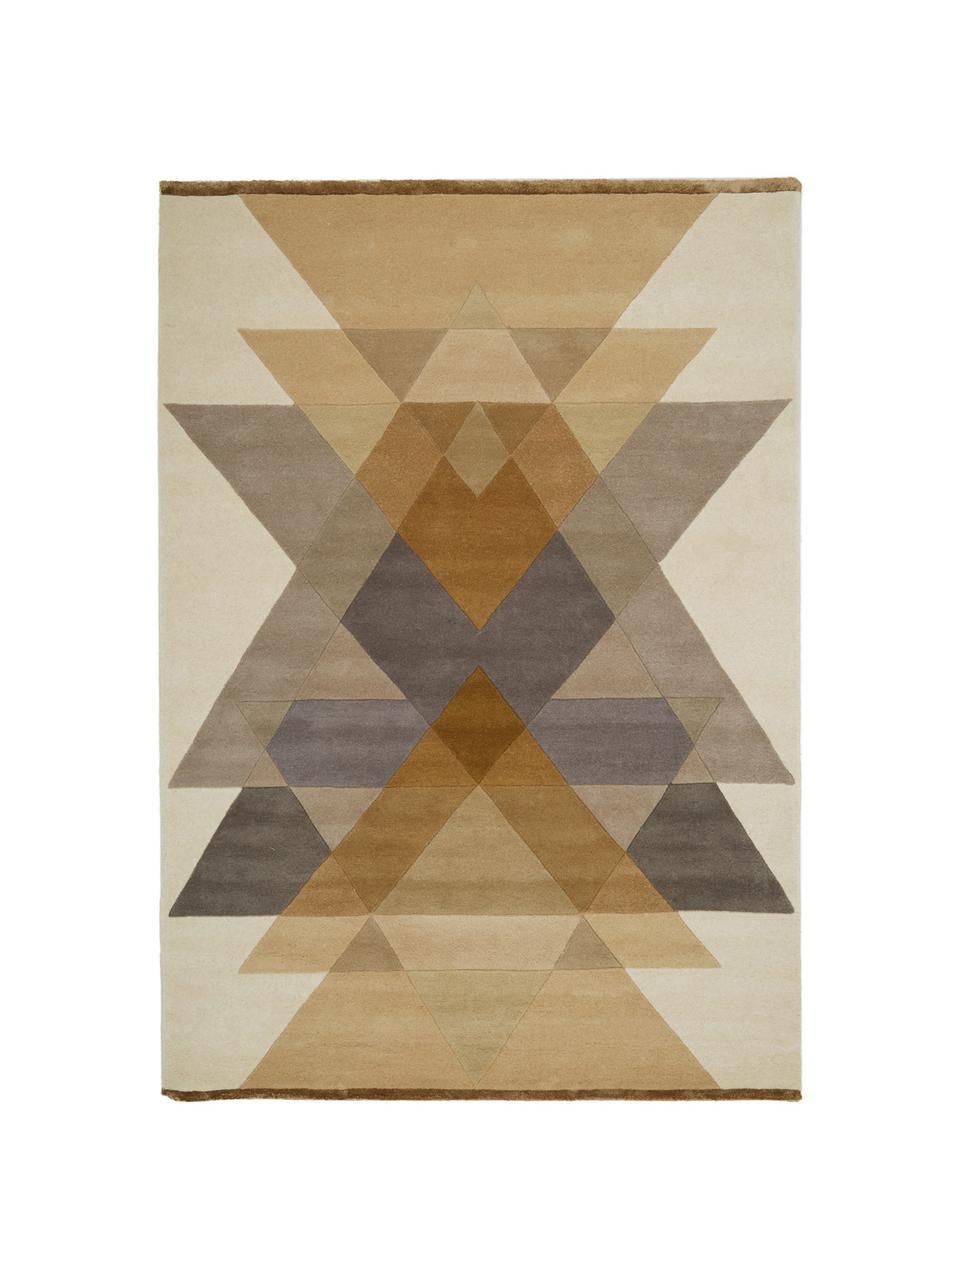 Tapis design en laine tufté main Freya, Jaune moutarde, beige, gris, brun